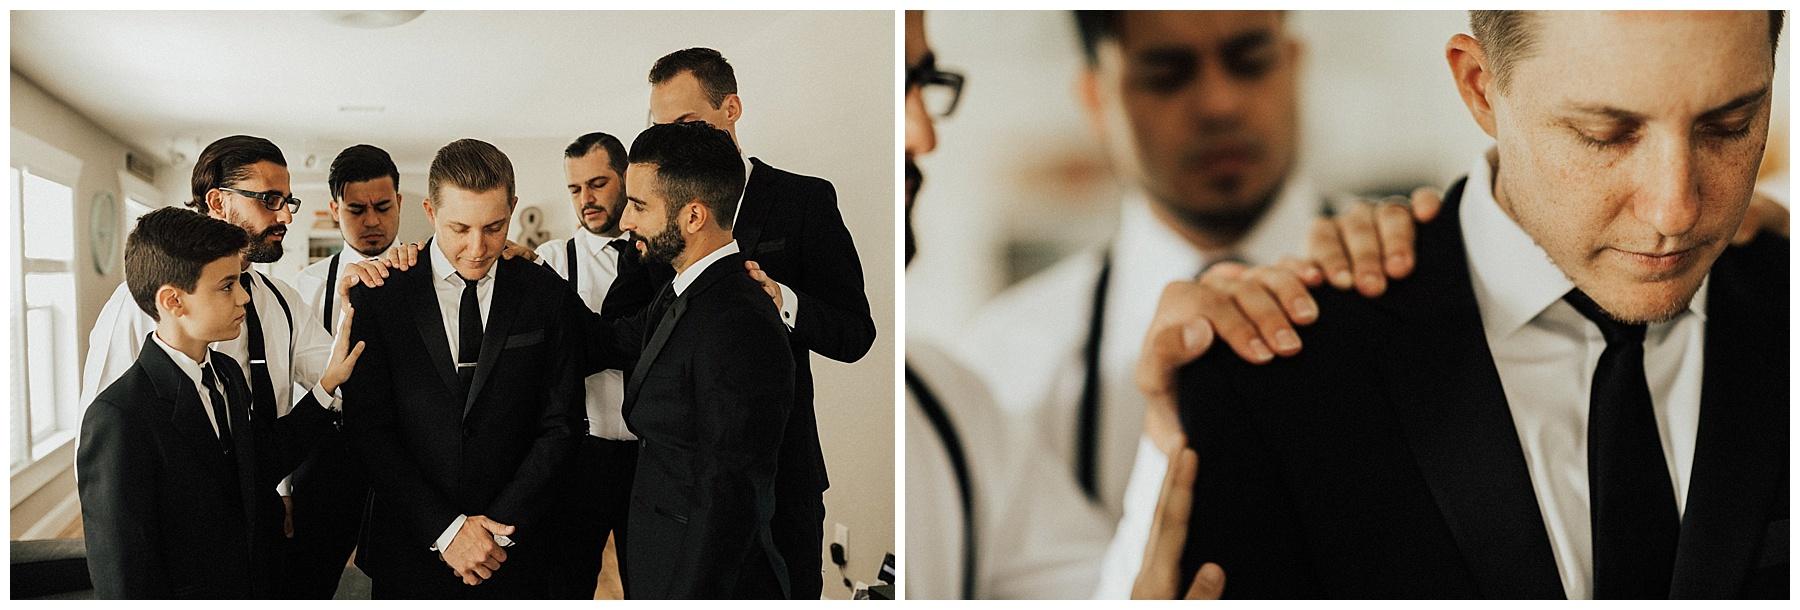 YBOR Wedding Tampa Wedding Photographer-22.jpg